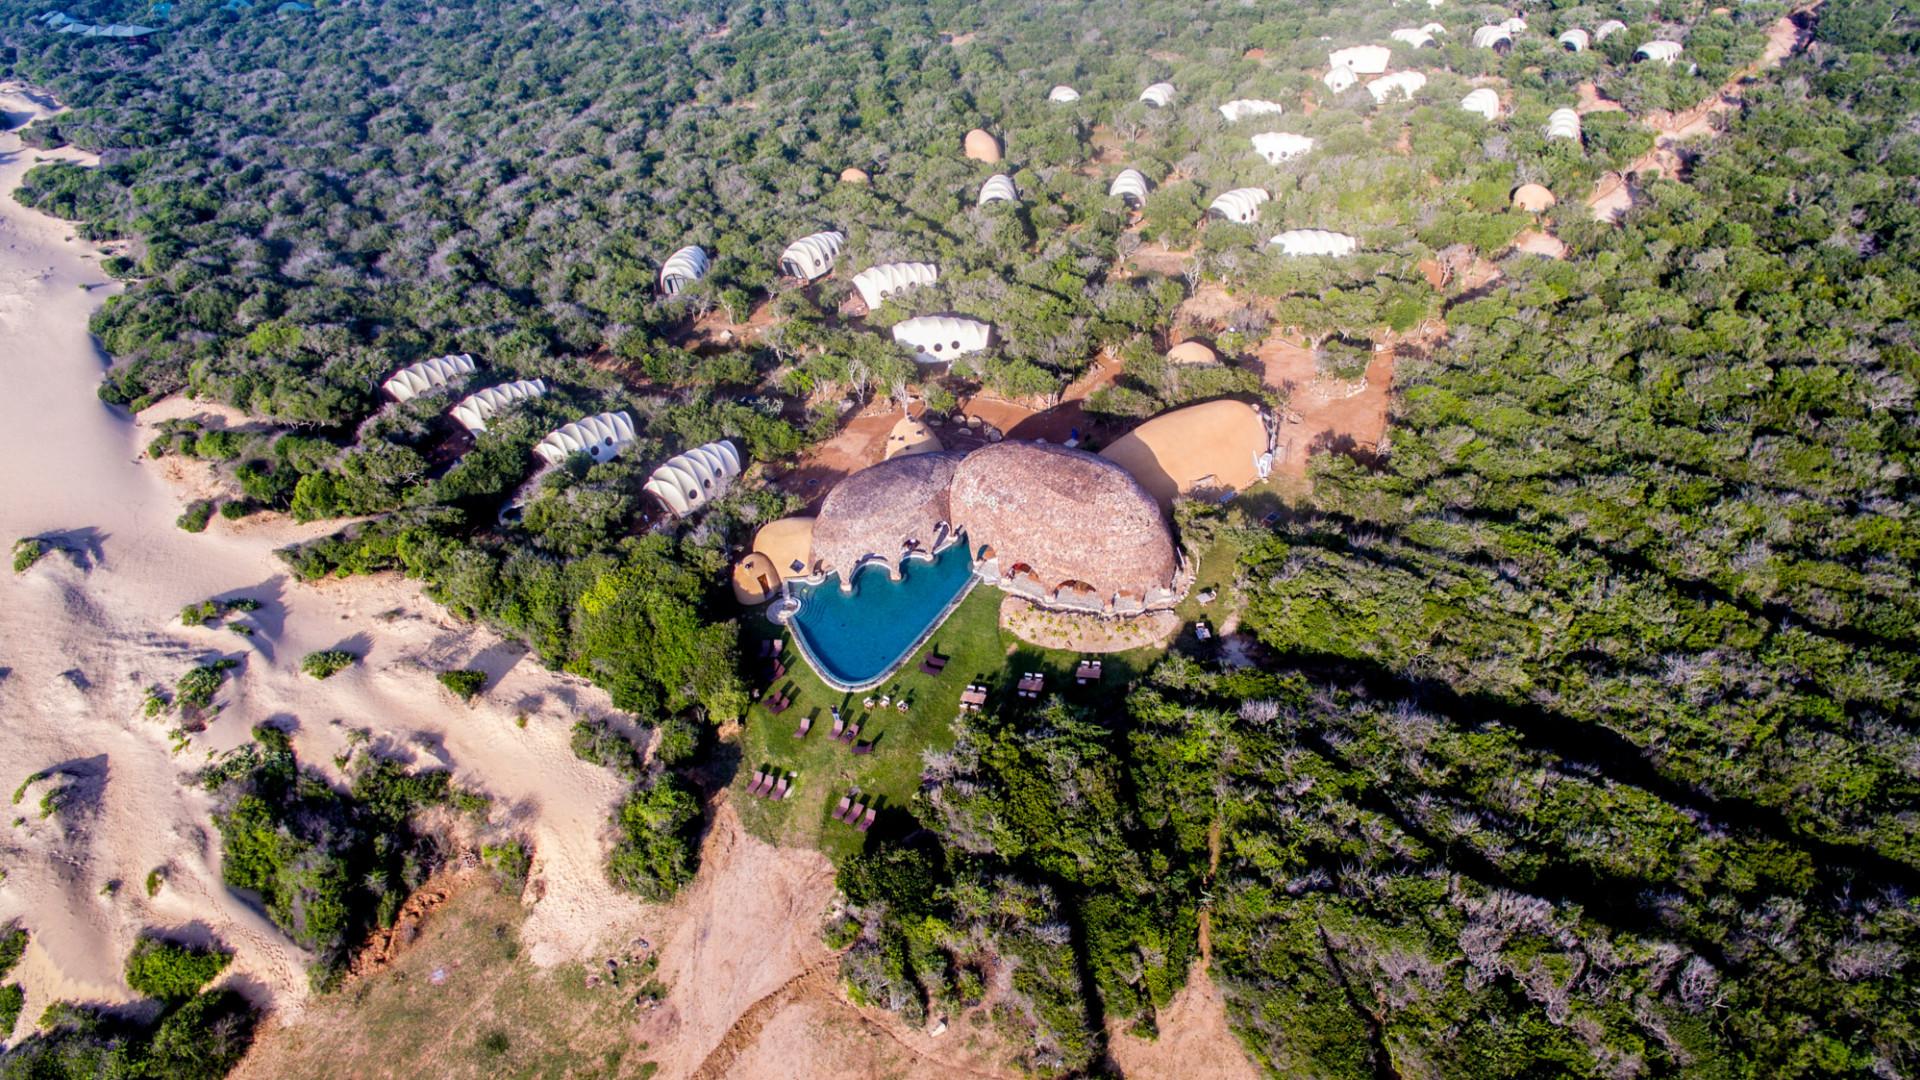 Aerial view of Wild Coast Tented Lodge in Sri Lanka